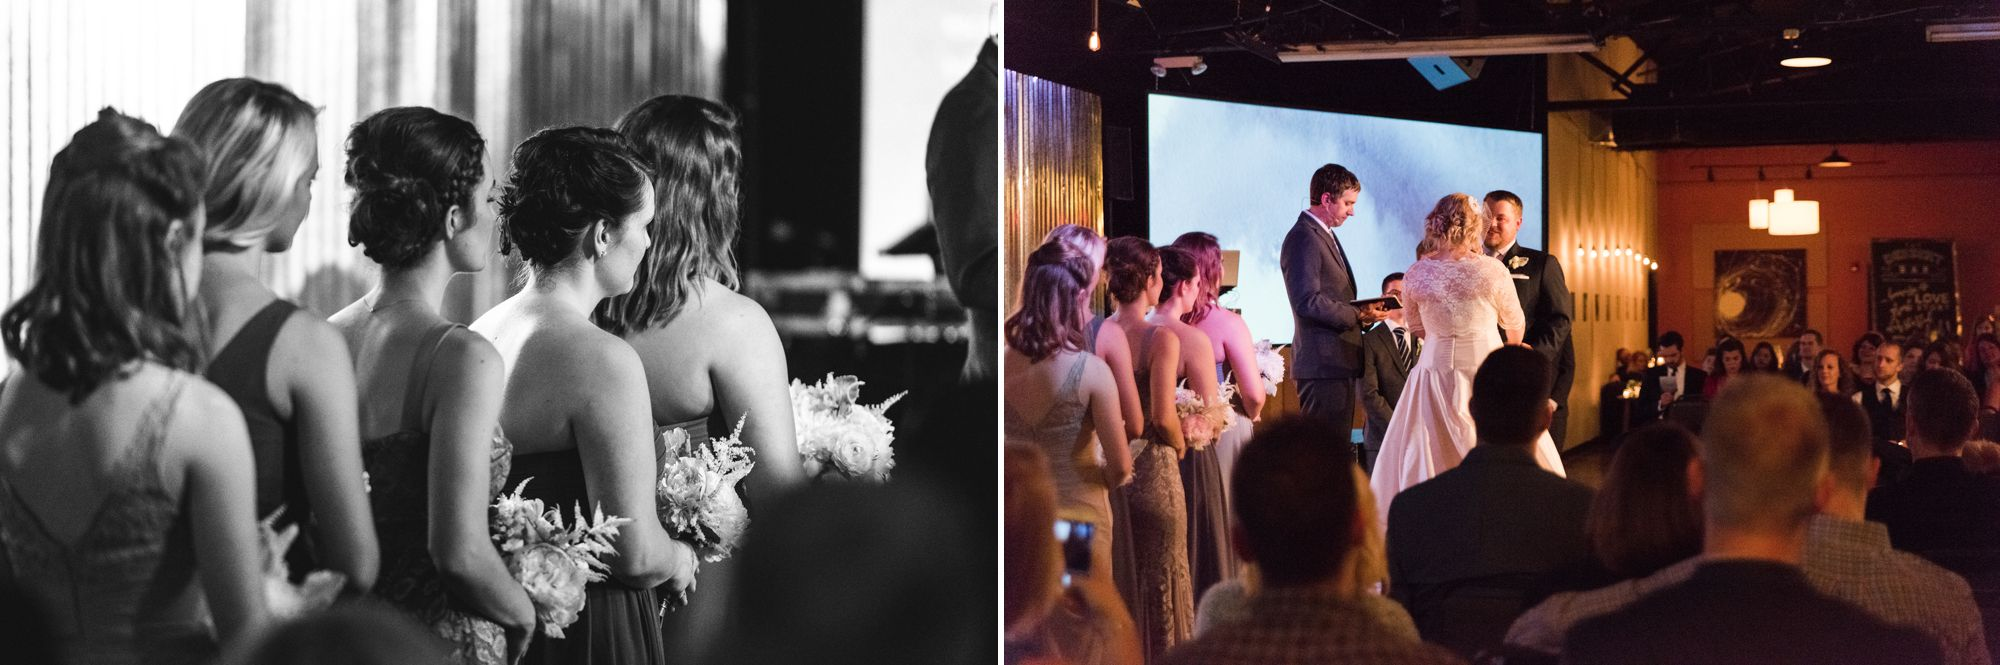 uptown-charlotte-warhouse-wedding 92